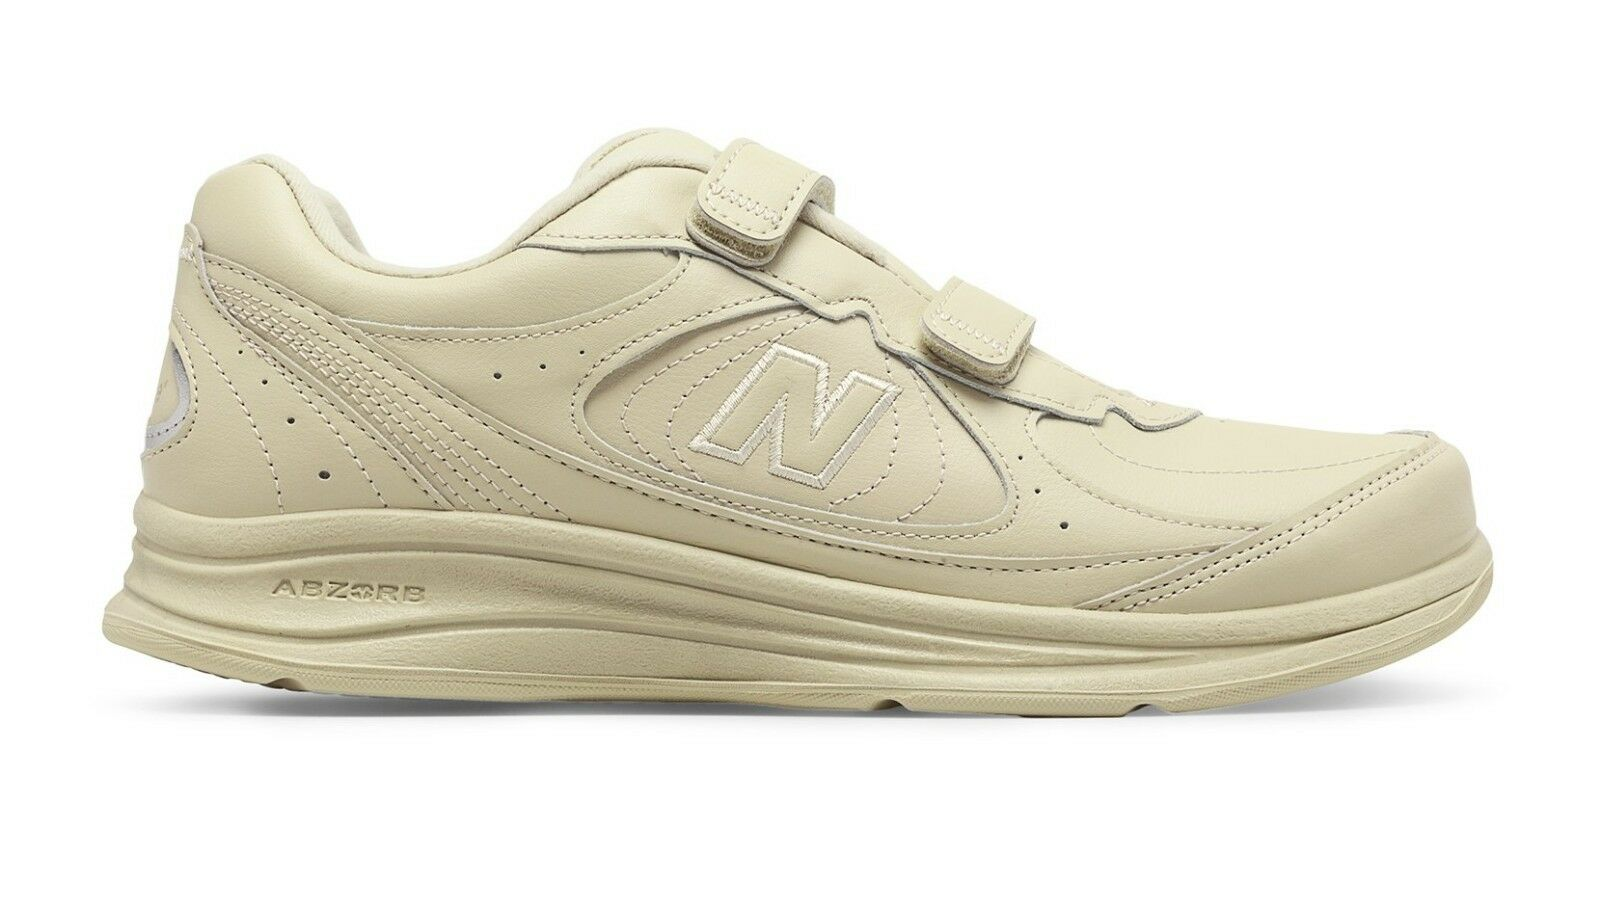 New Balance MW577VB Men's Hook and Loop 577 Bone Leather Walking shoes